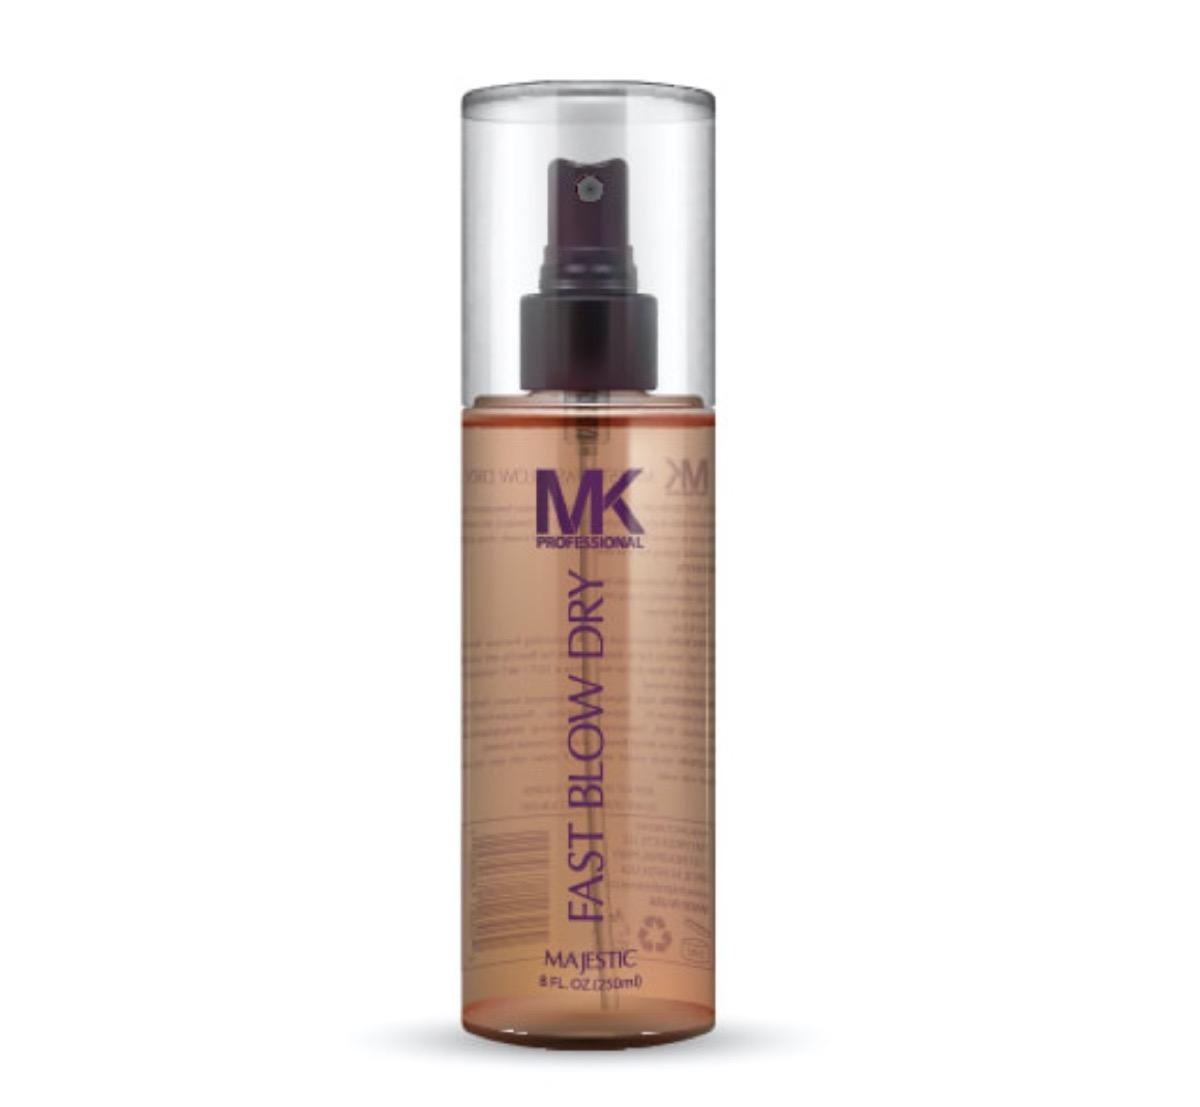 bottle of mk blow dry spray